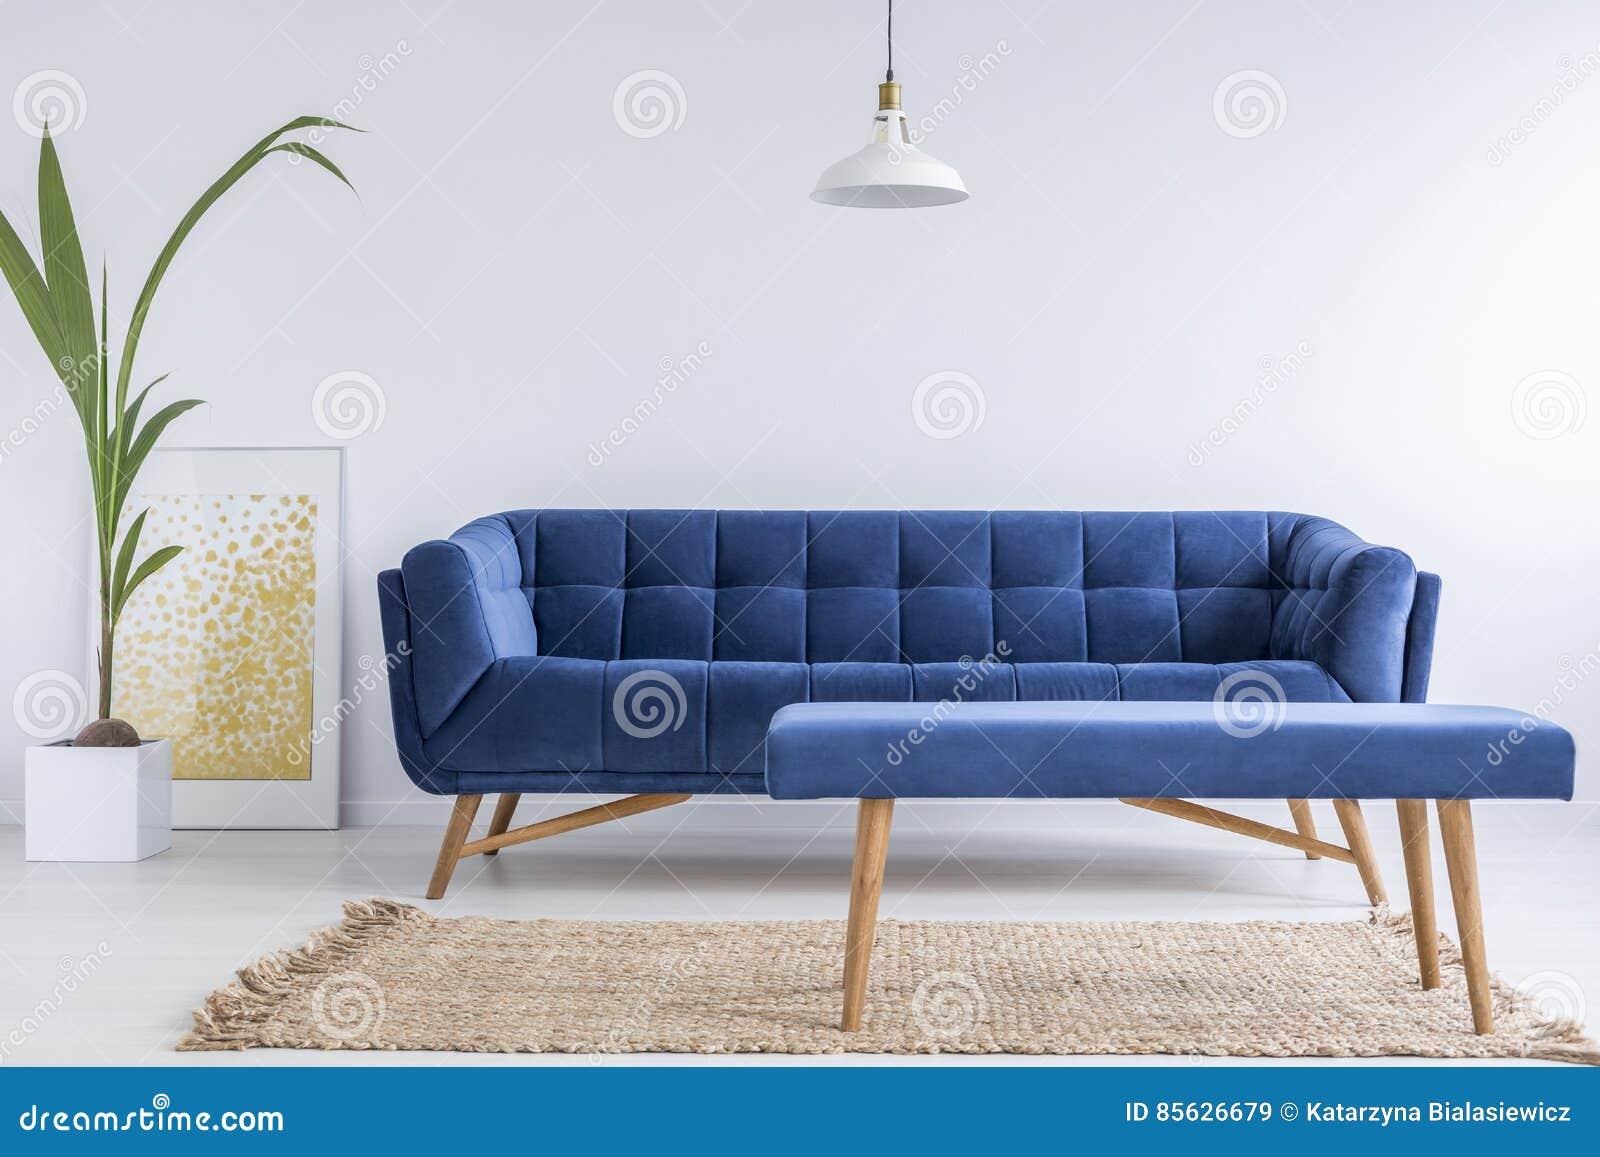 White apartment with blue sofa stock image cartoondealer for Blue and white sofa